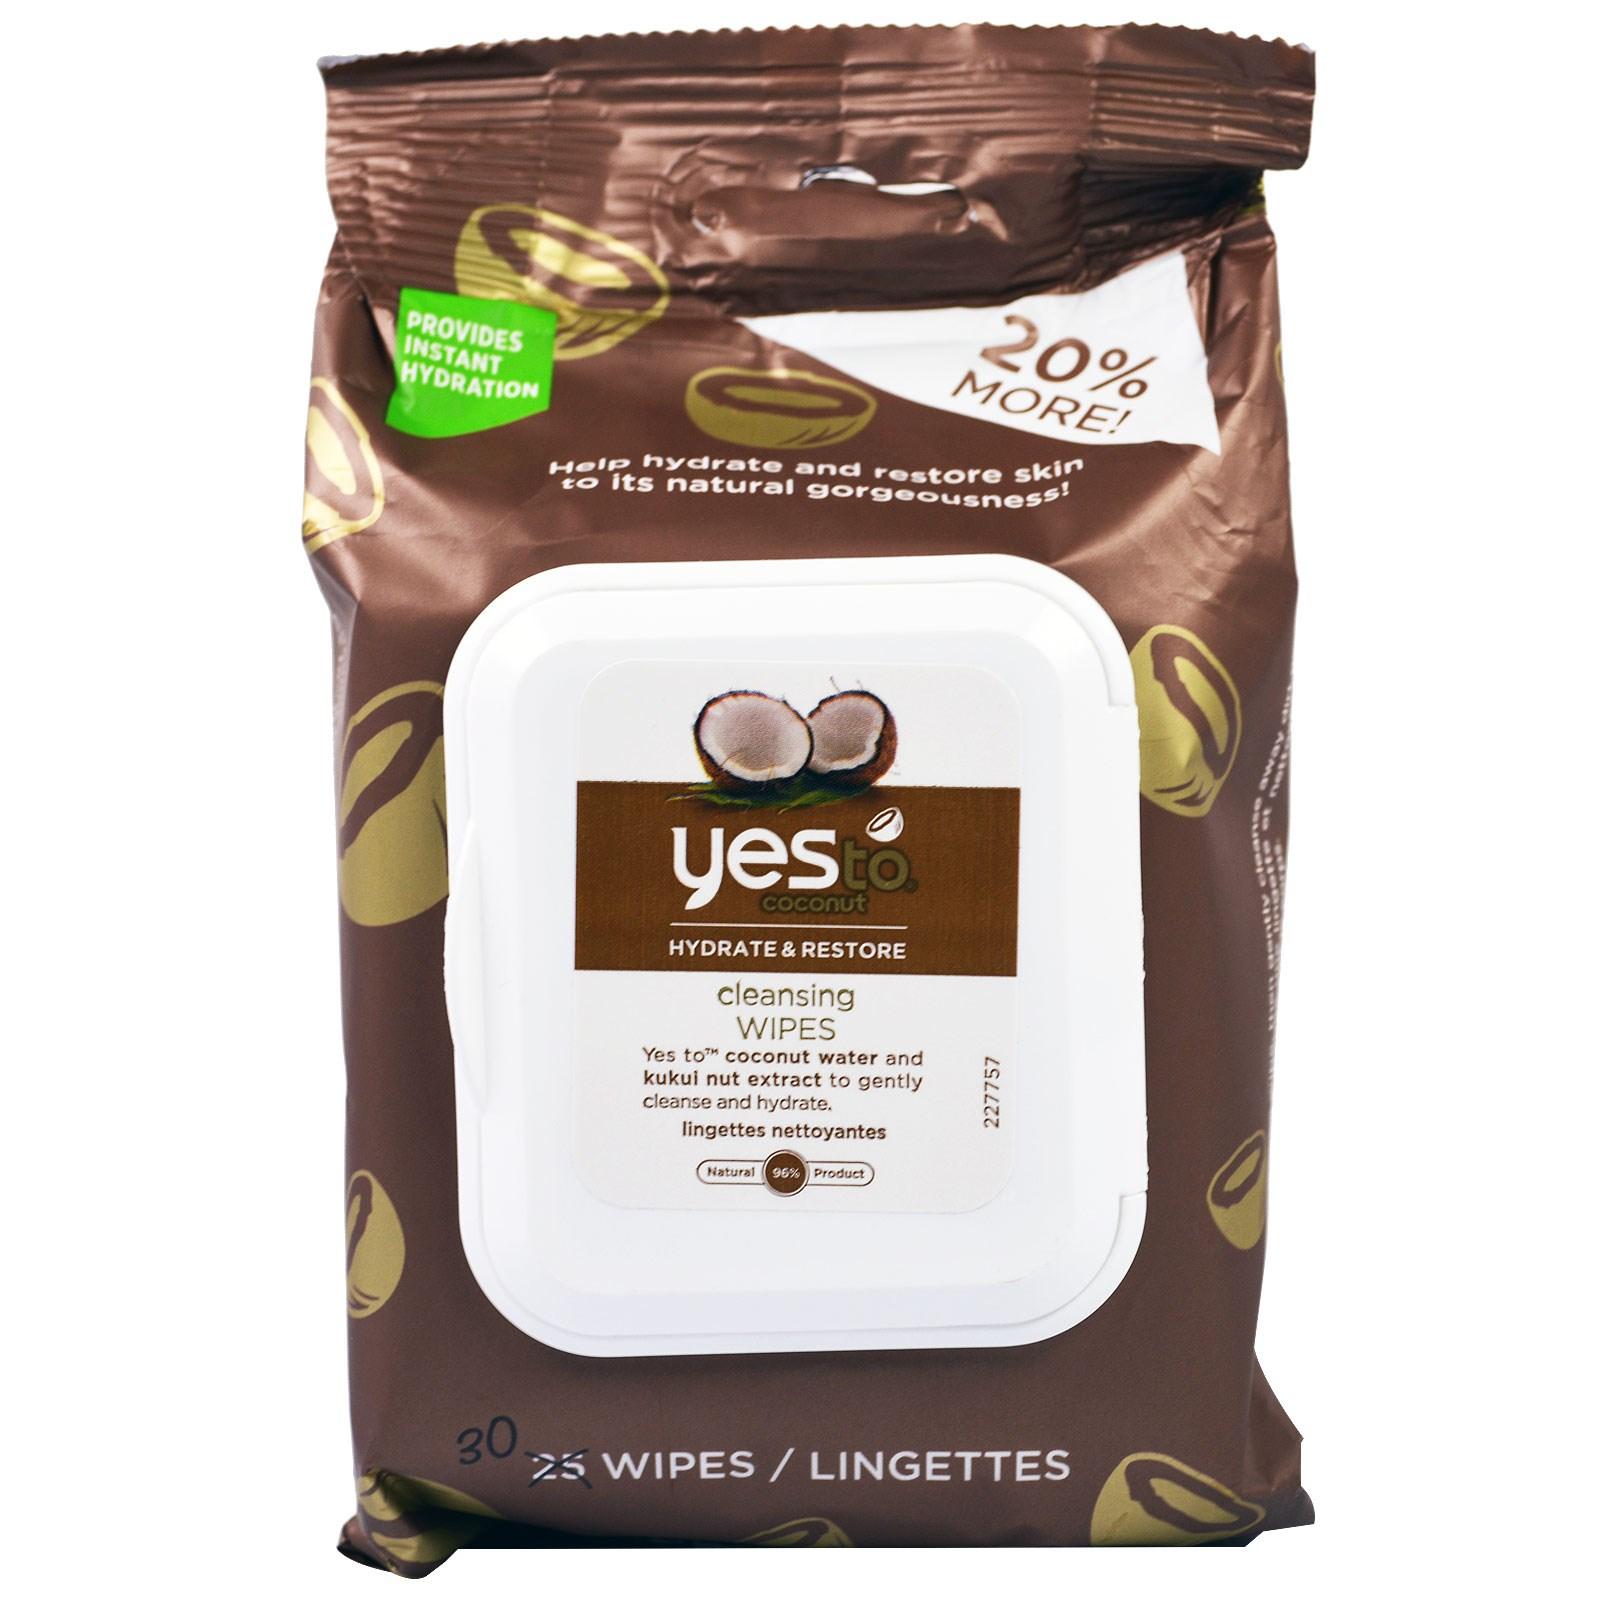 Yes to, Увлажняет и восстанавливает, очищающие салфетки, кокос, 30 салфеток